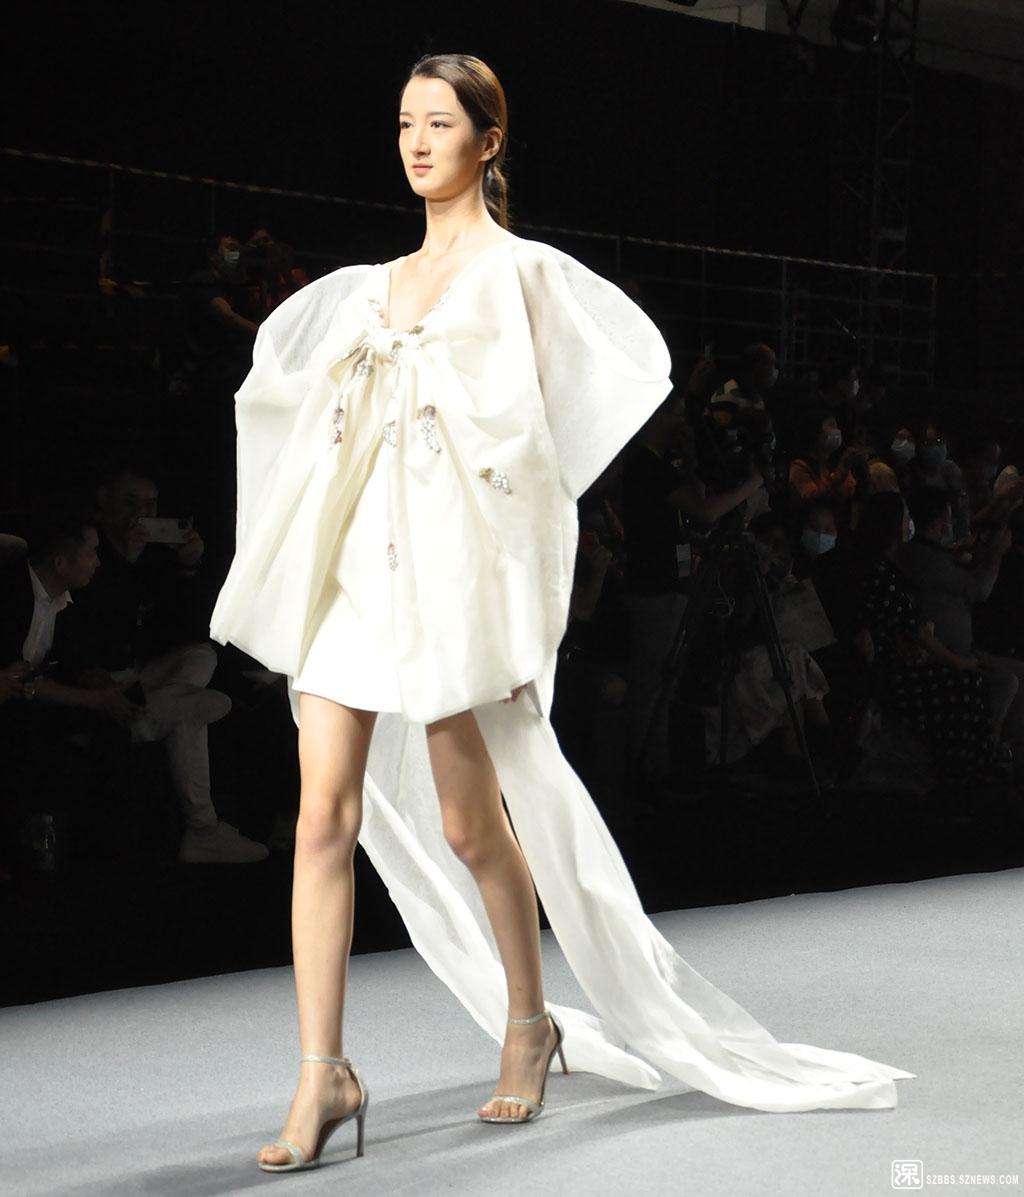 DSC_1044裙装.JPG